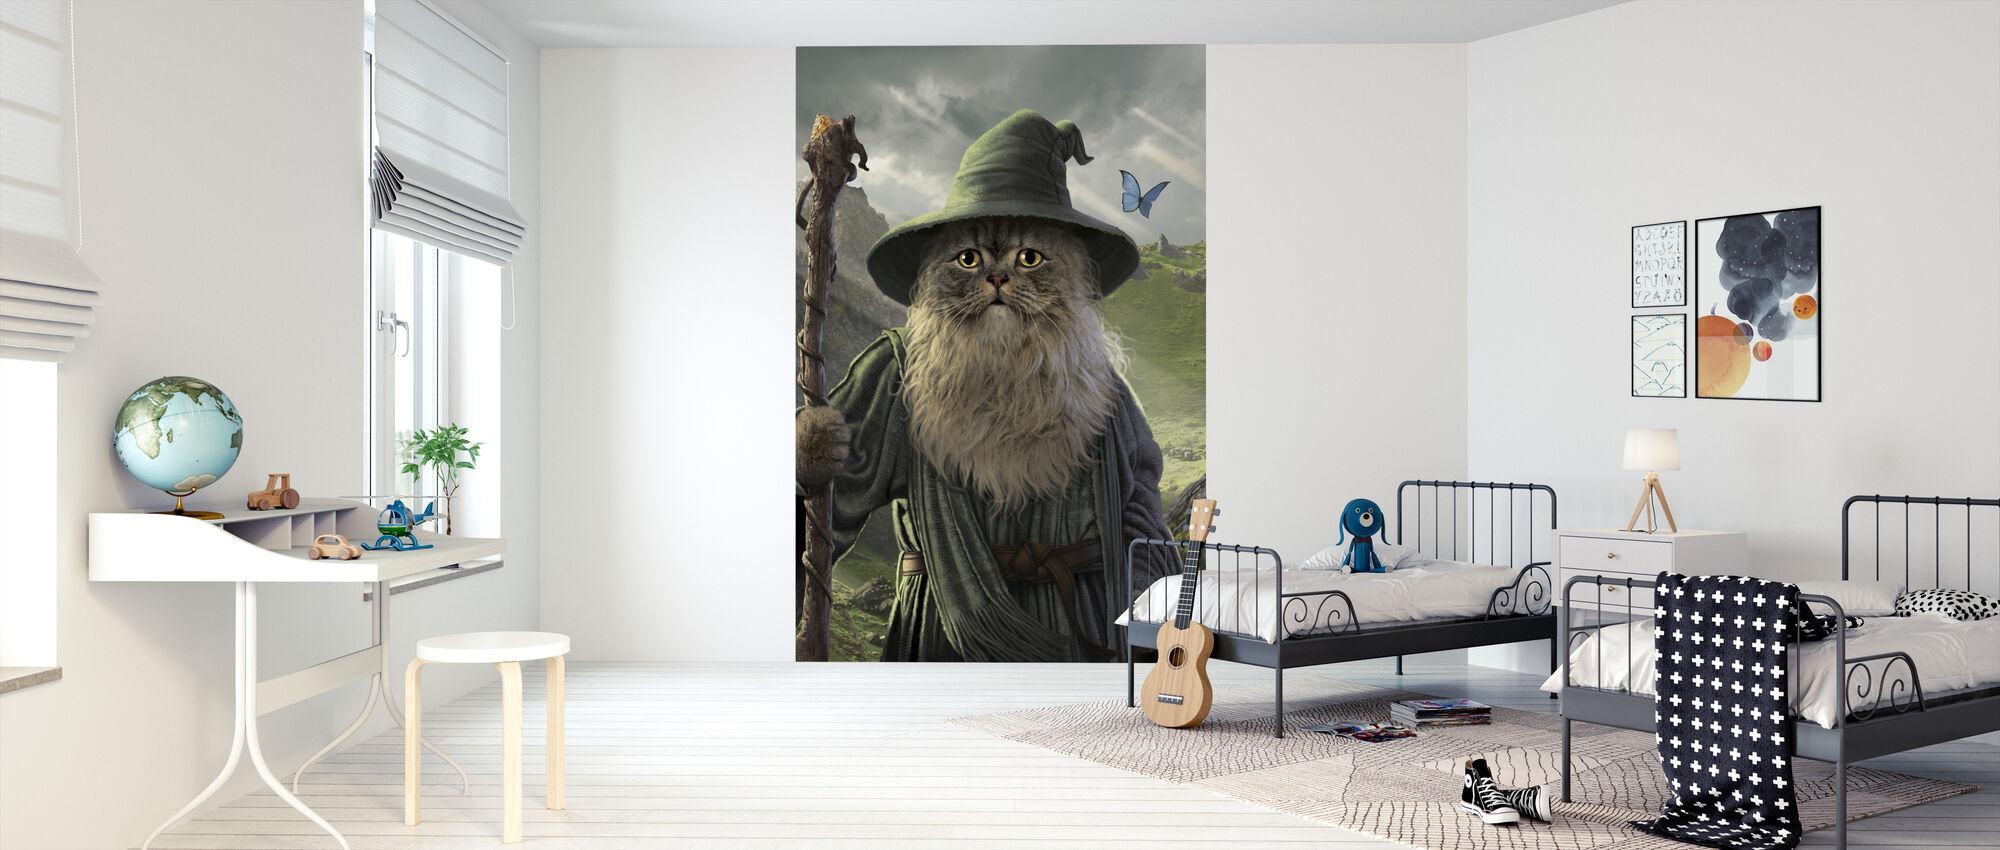 Catdalf - Wallpaper - Kids Room